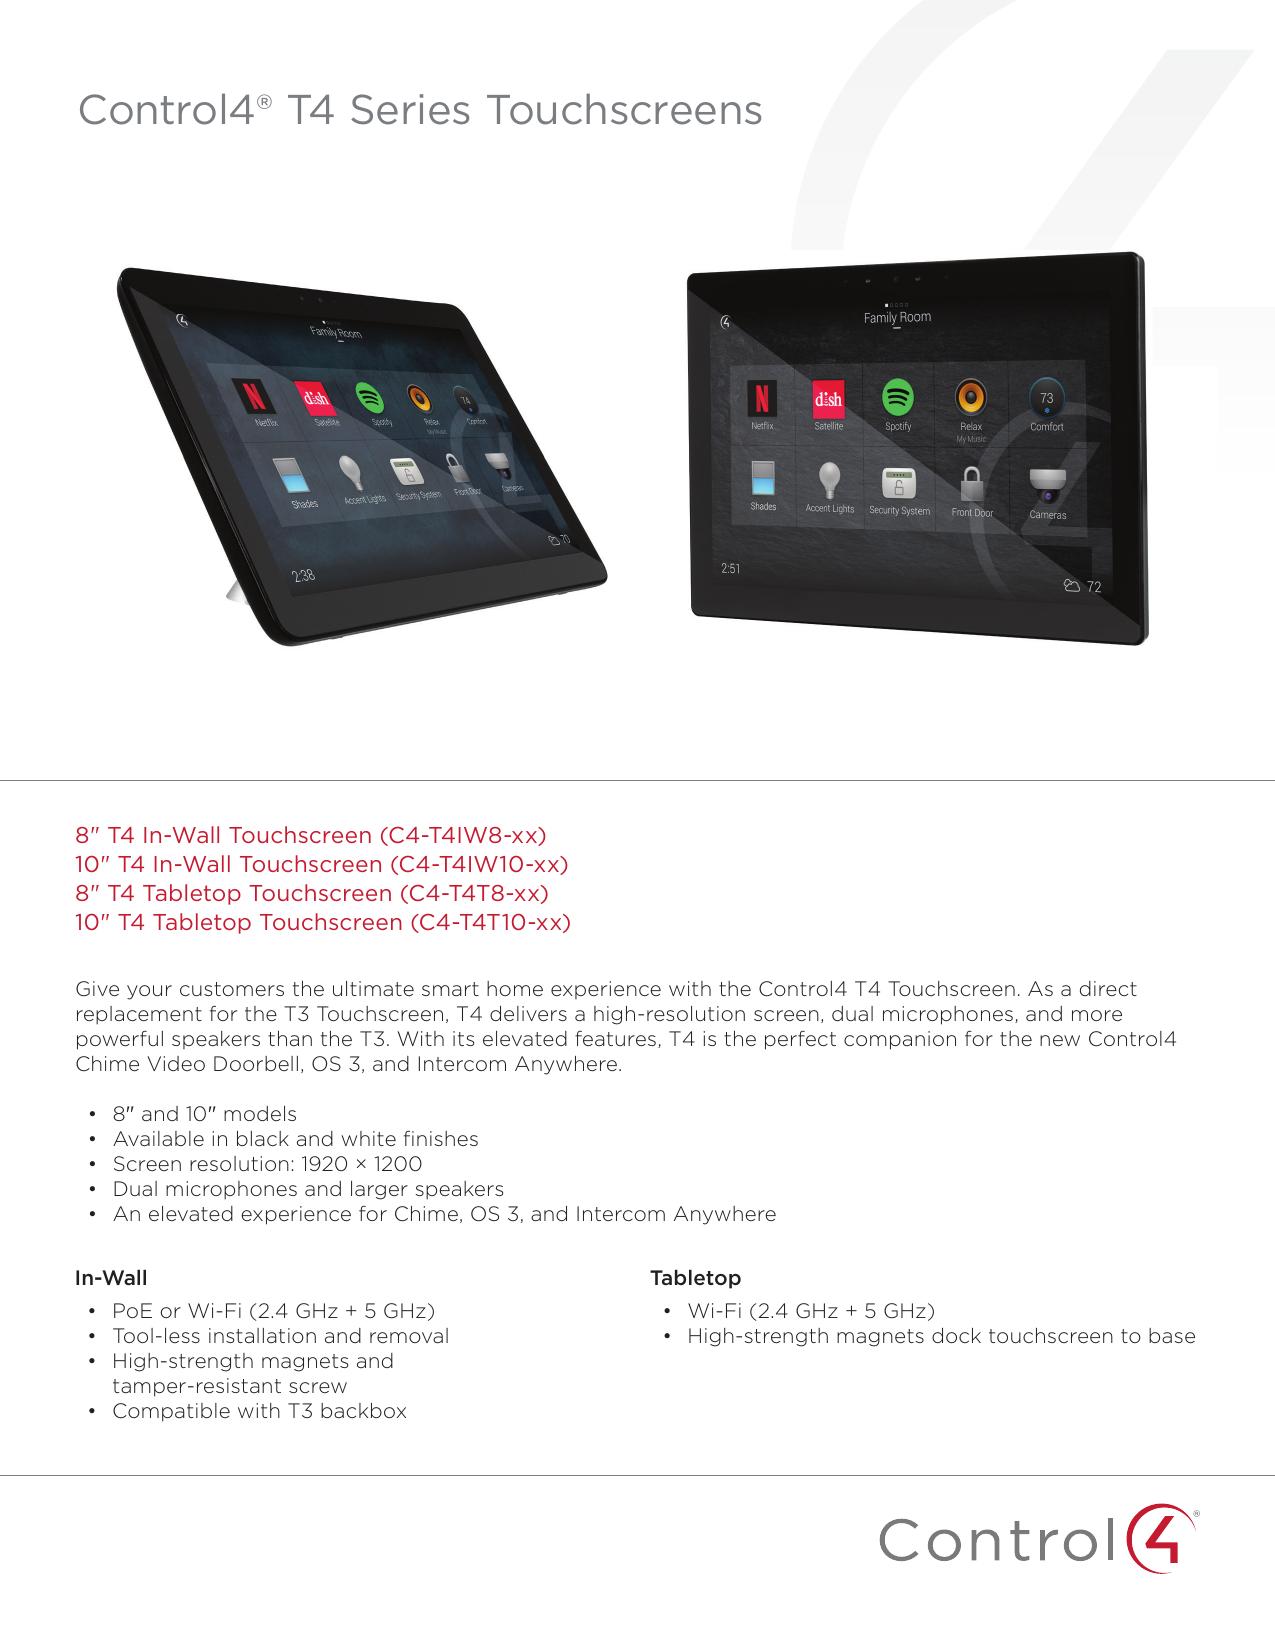 Control4 T4 Series Touchscreen Datasheet | Manualzz